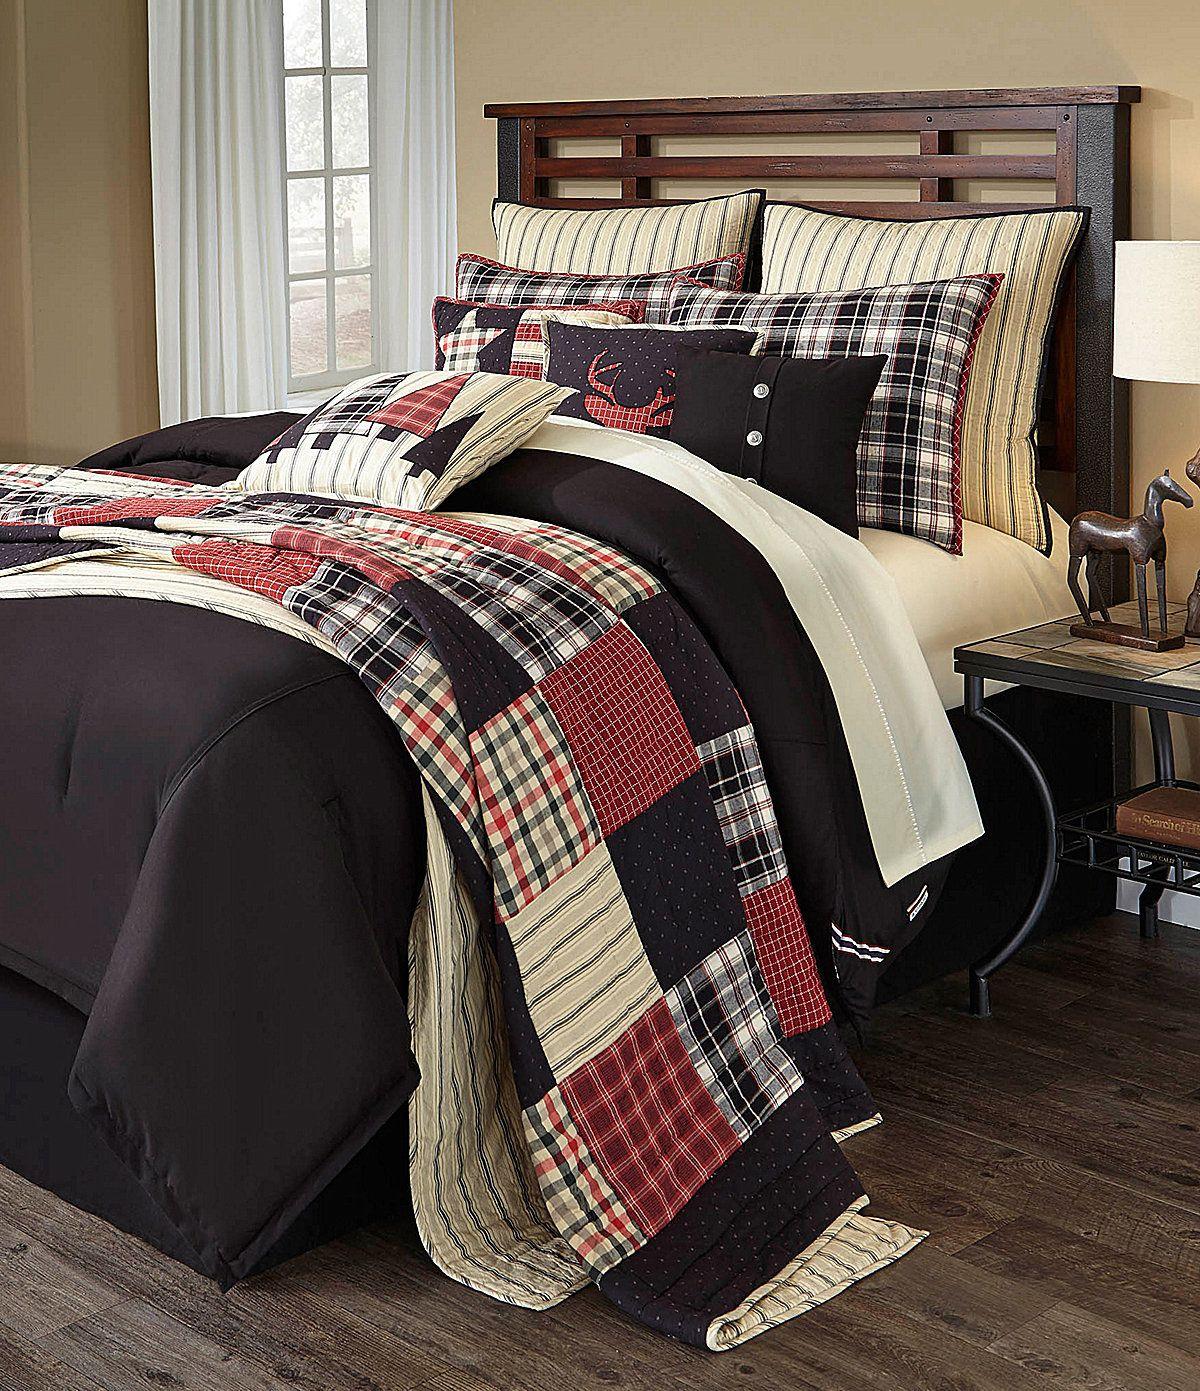 Cremieux Trenton Quilt | Dillards.com | ideas for the house ... : dillards quilts - Adamdwight.com